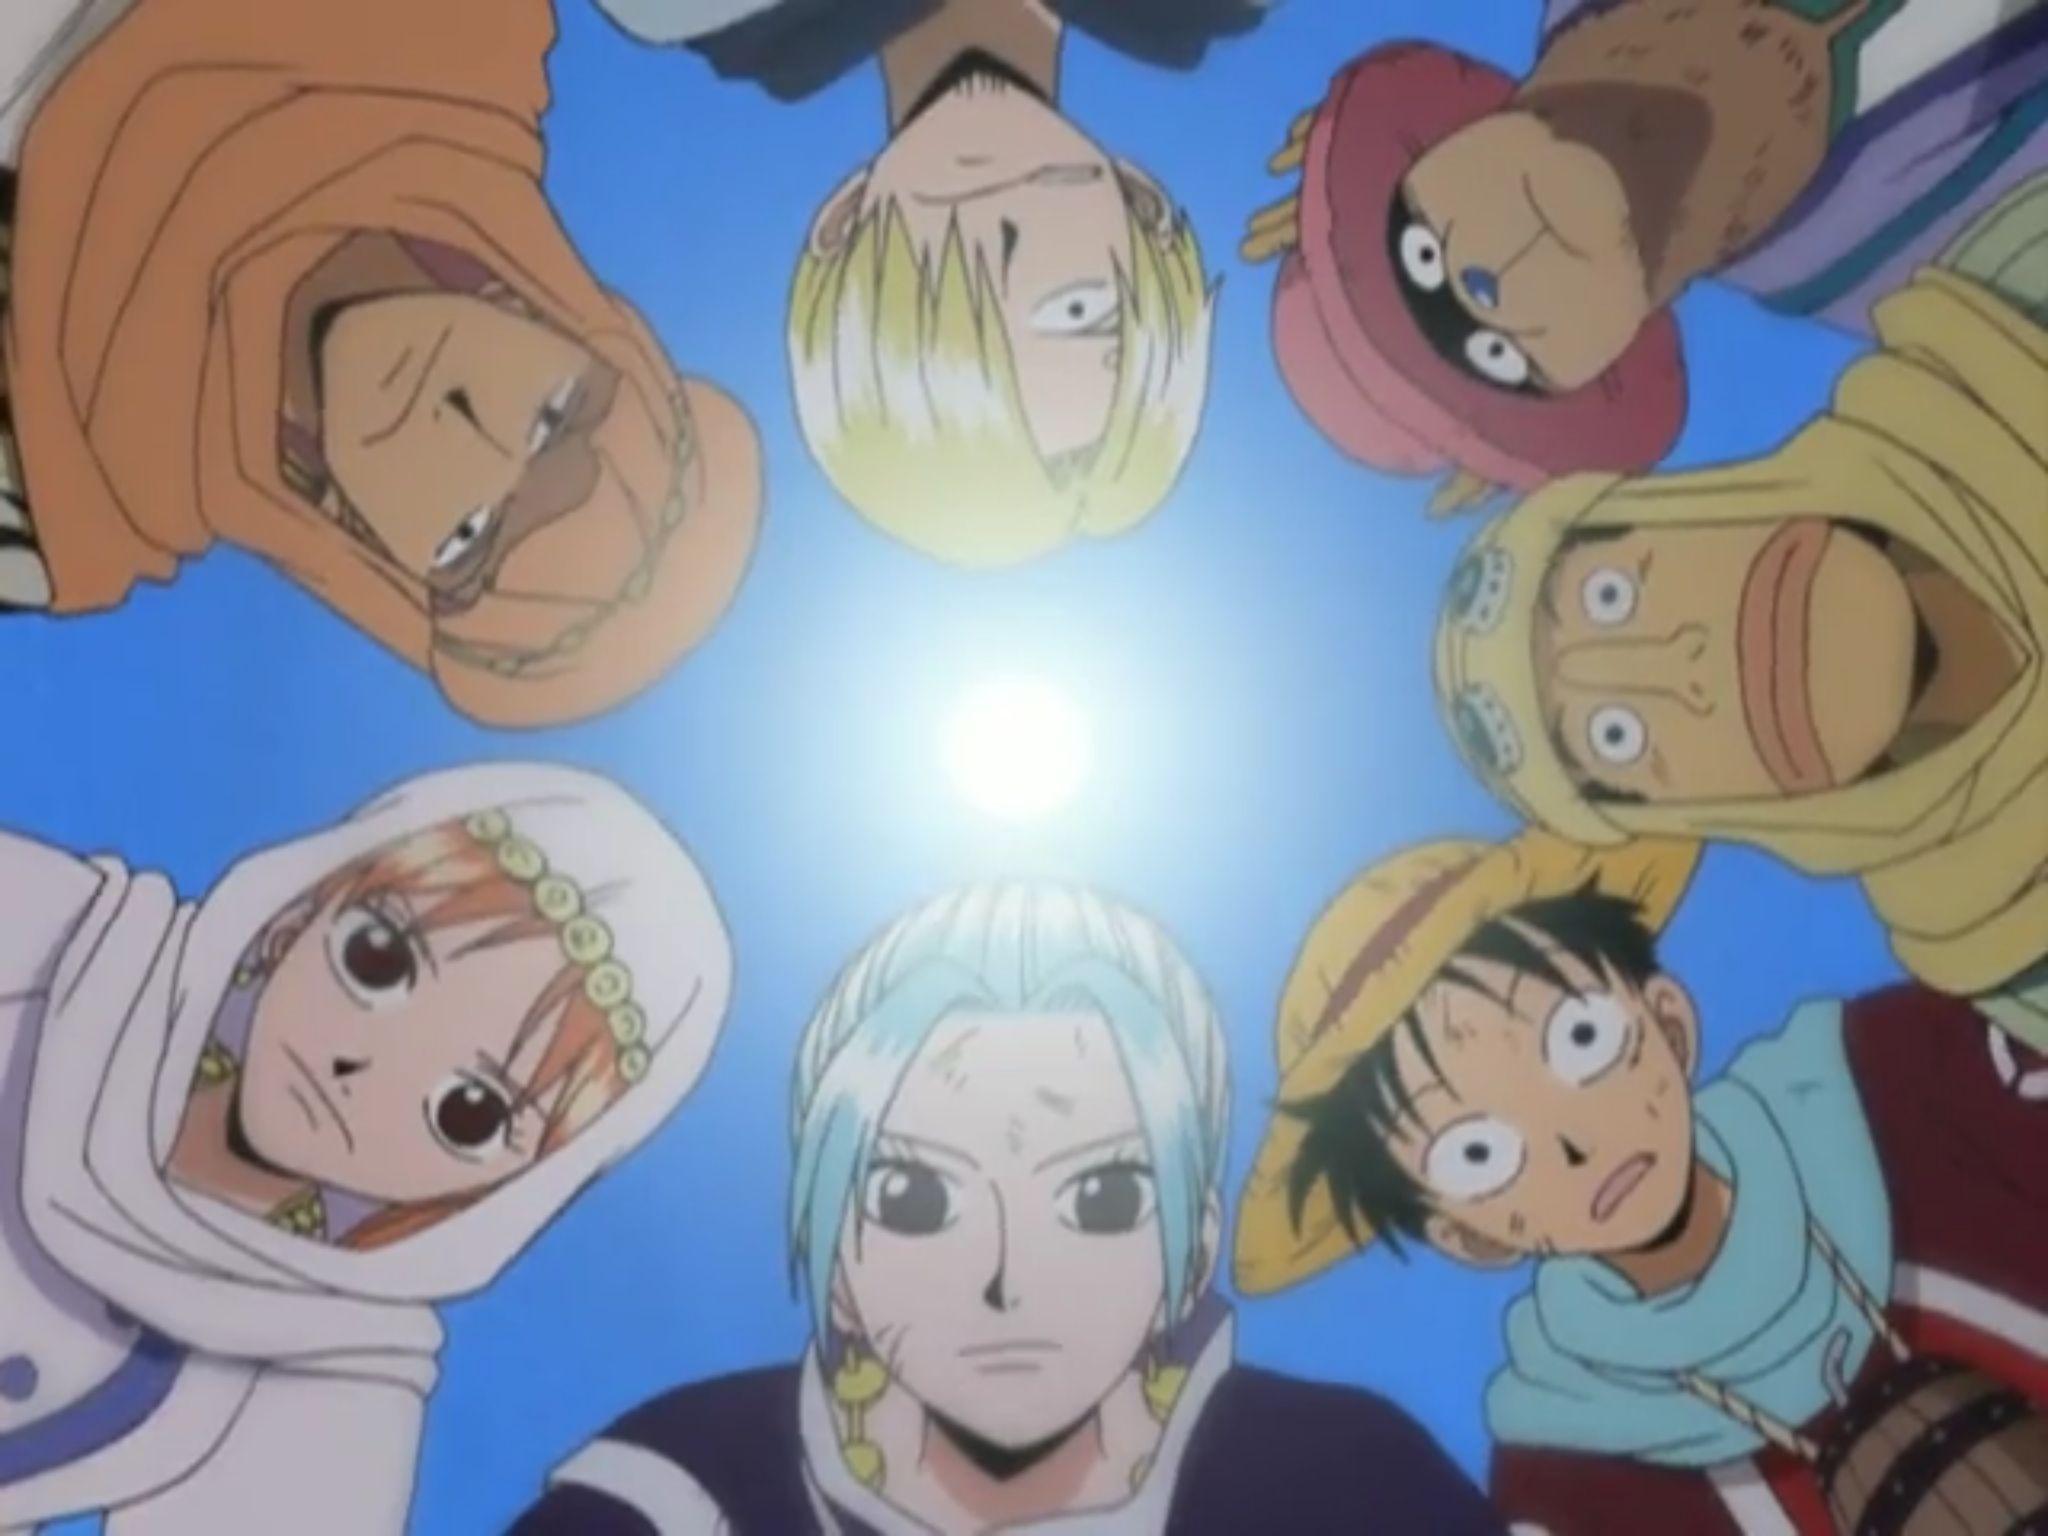 Pin on Nerd Convert-Manga/Anime Love